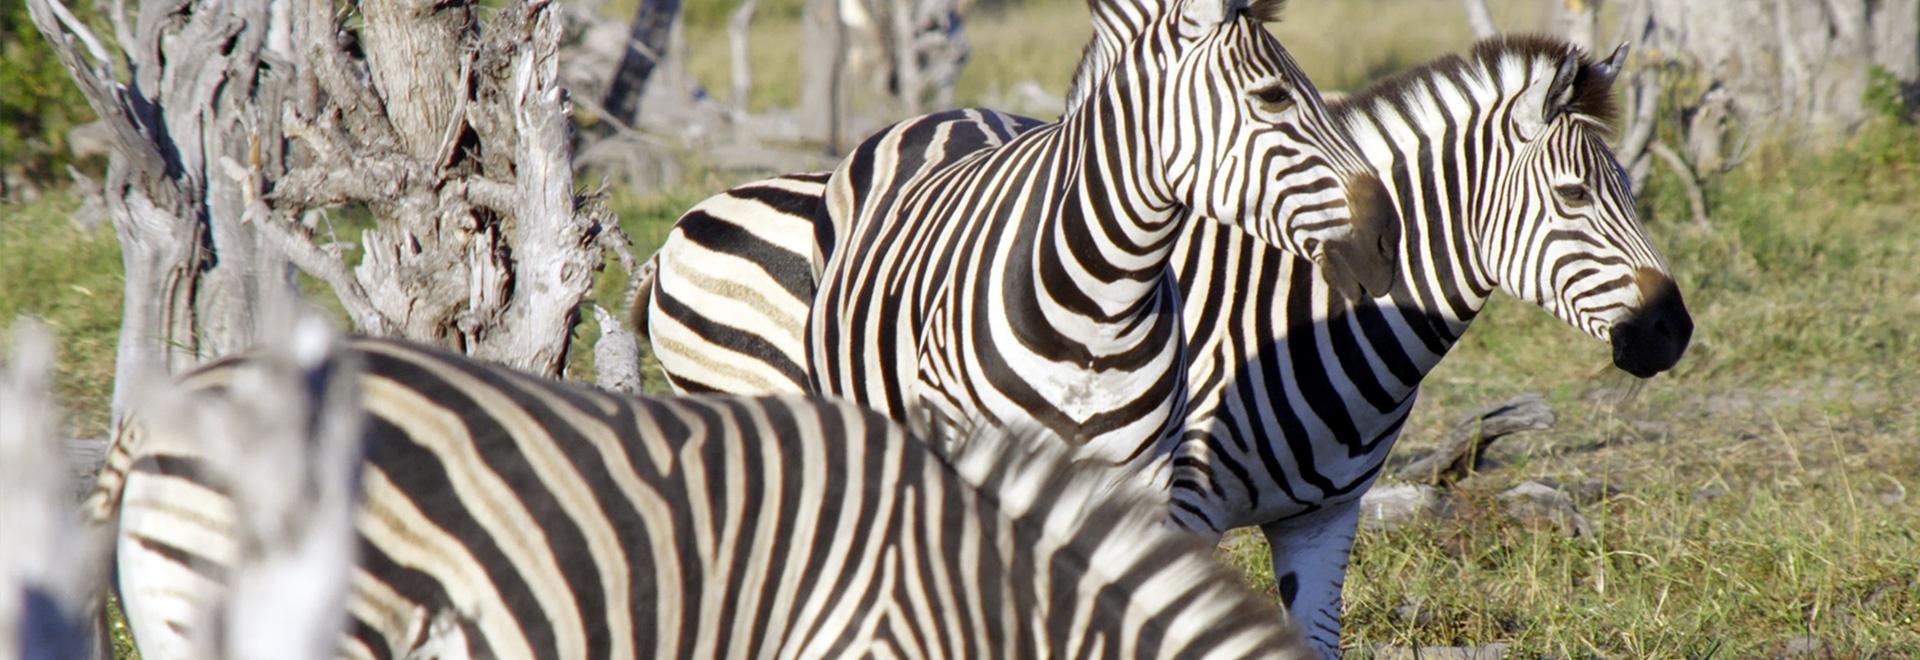 Orizzonti selvaggi d'Africa